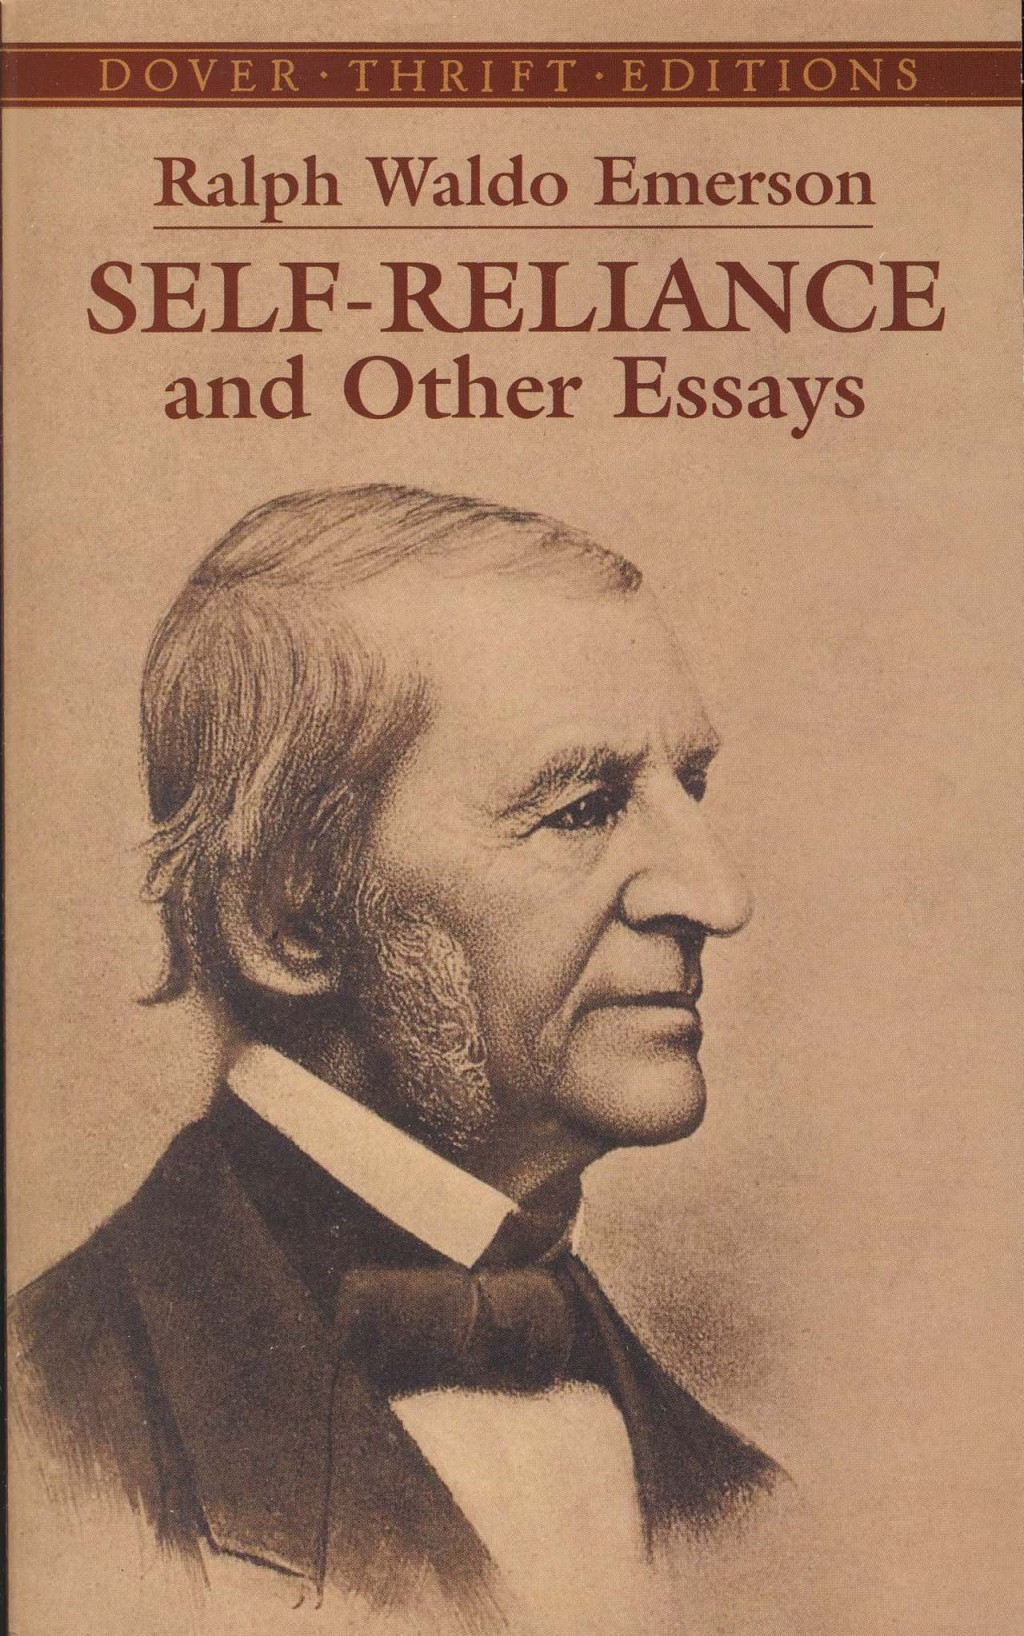 001 Essay Example 91btiwopxal Self Reliance And Other Formidable Essays Ralph Waldo Emerson Pdf Ekşi Large